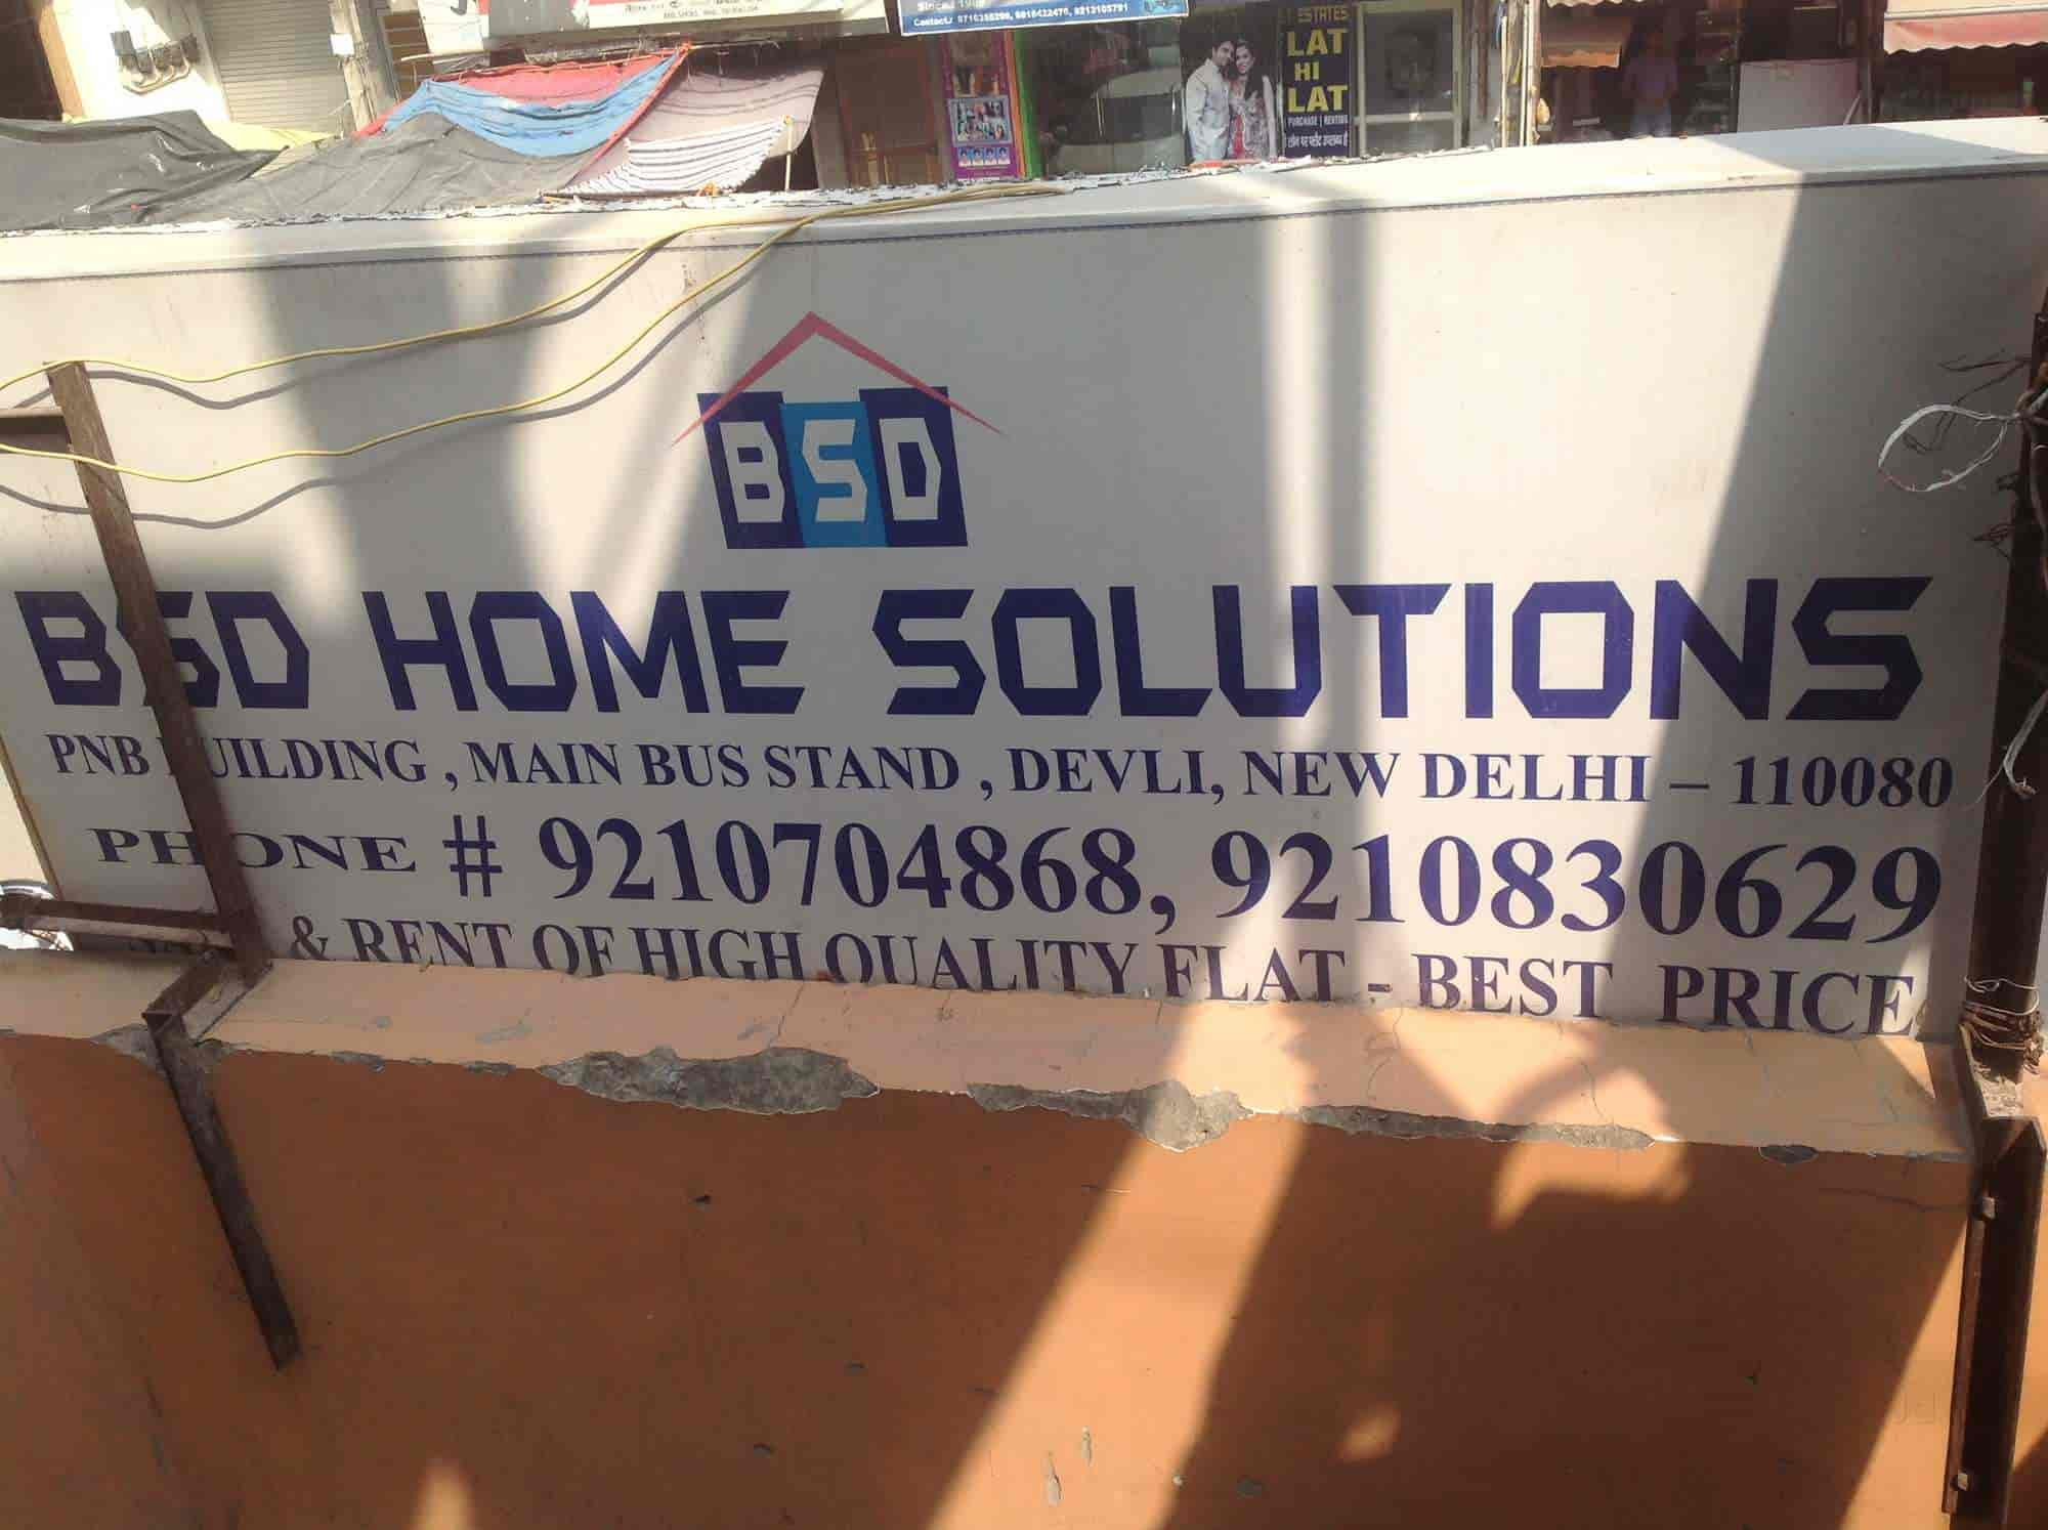 BSD Home Solution Photos, Devli Gaon, Delhi- Pictures